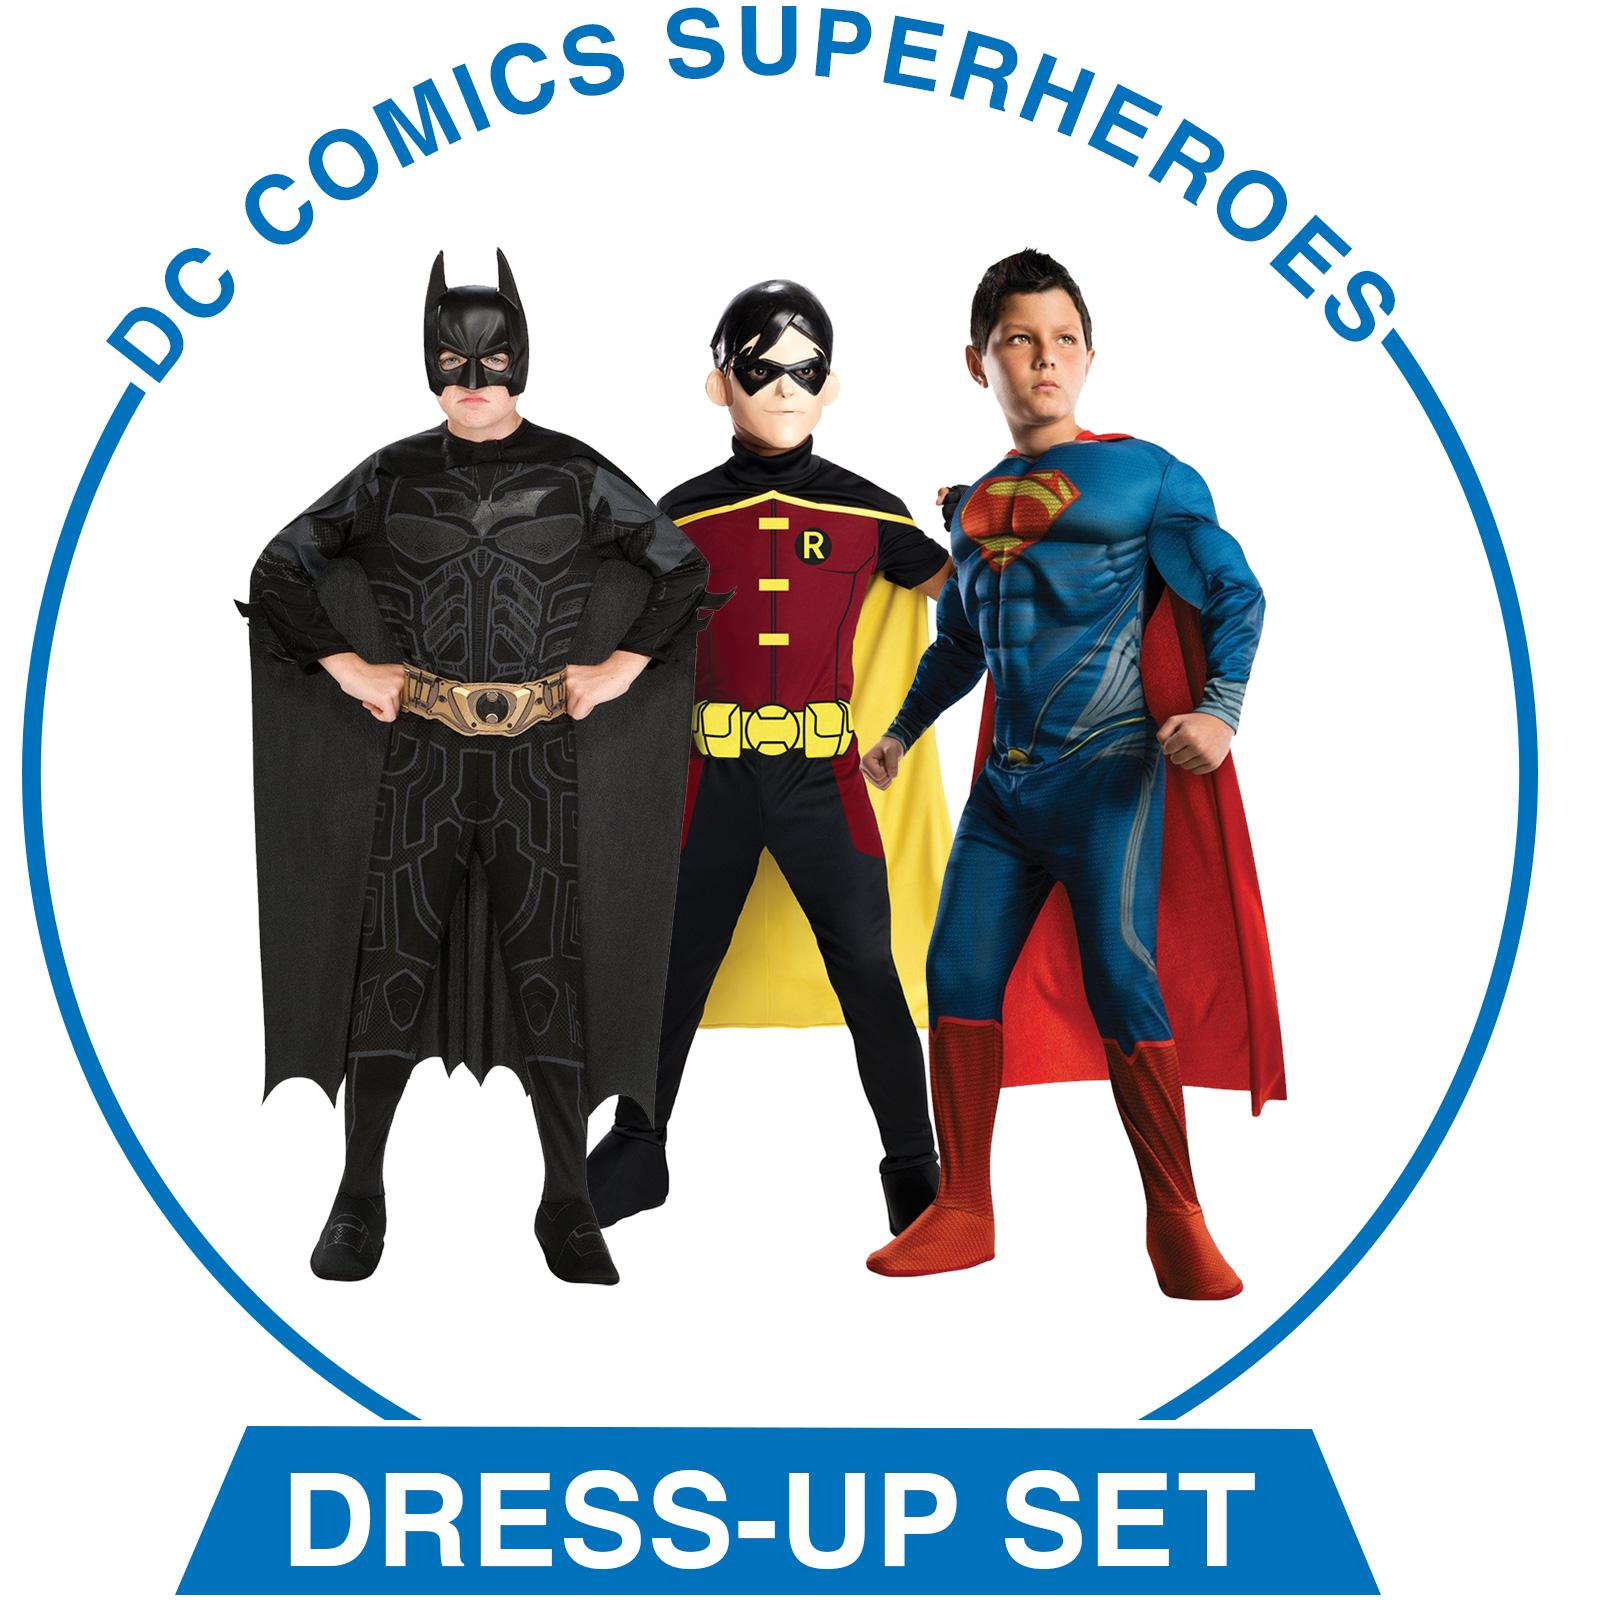 DC Comics Superheroes Dress-Up Set - Boys